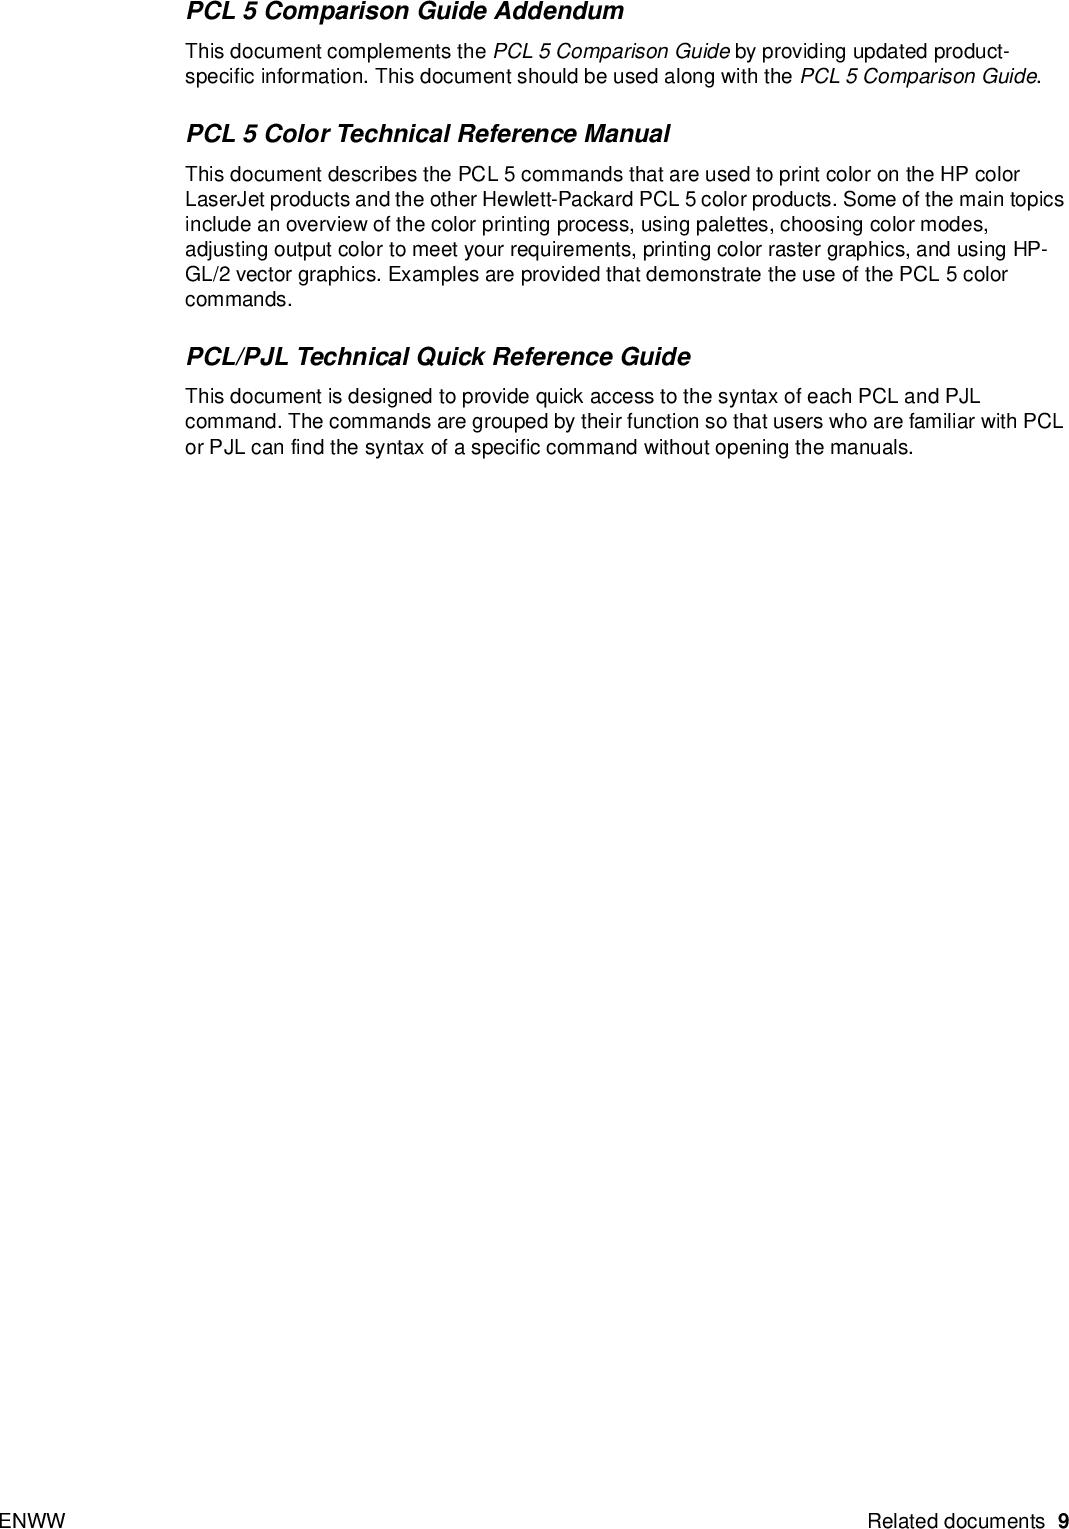 HP Printer Job Language Technical Reference Addendum ENWW